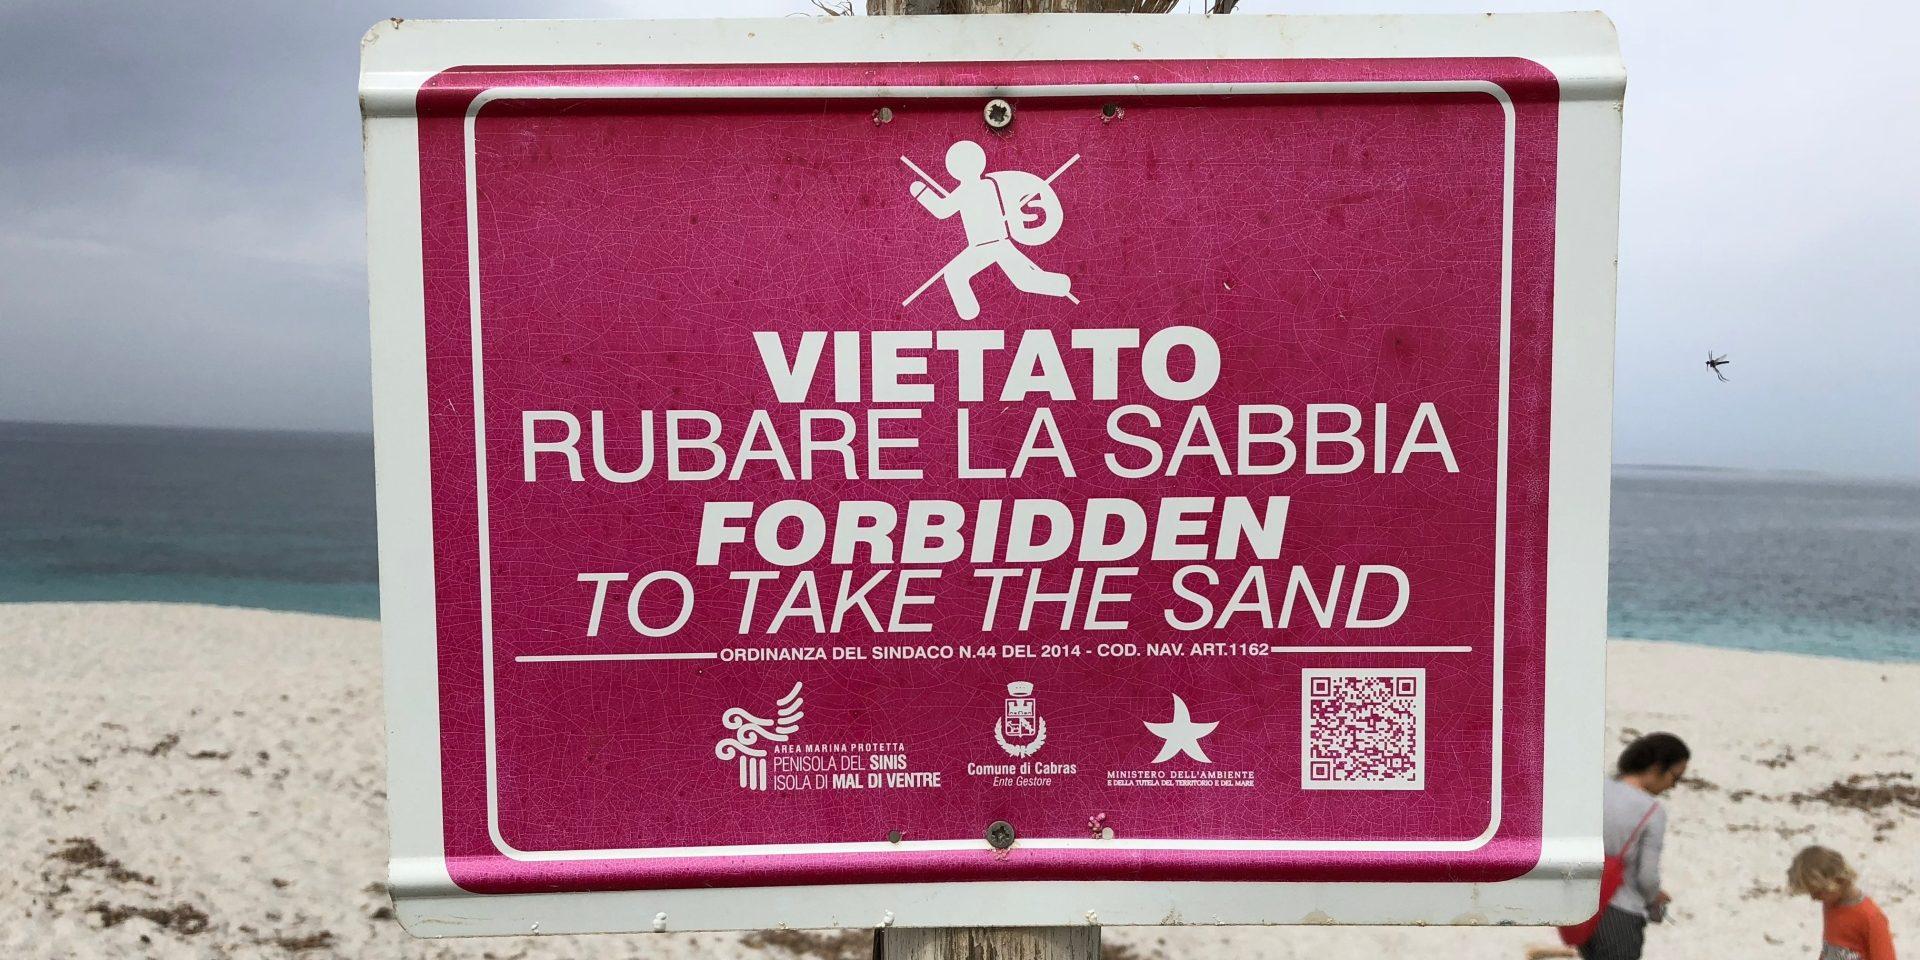 Vietato rubare sabbia